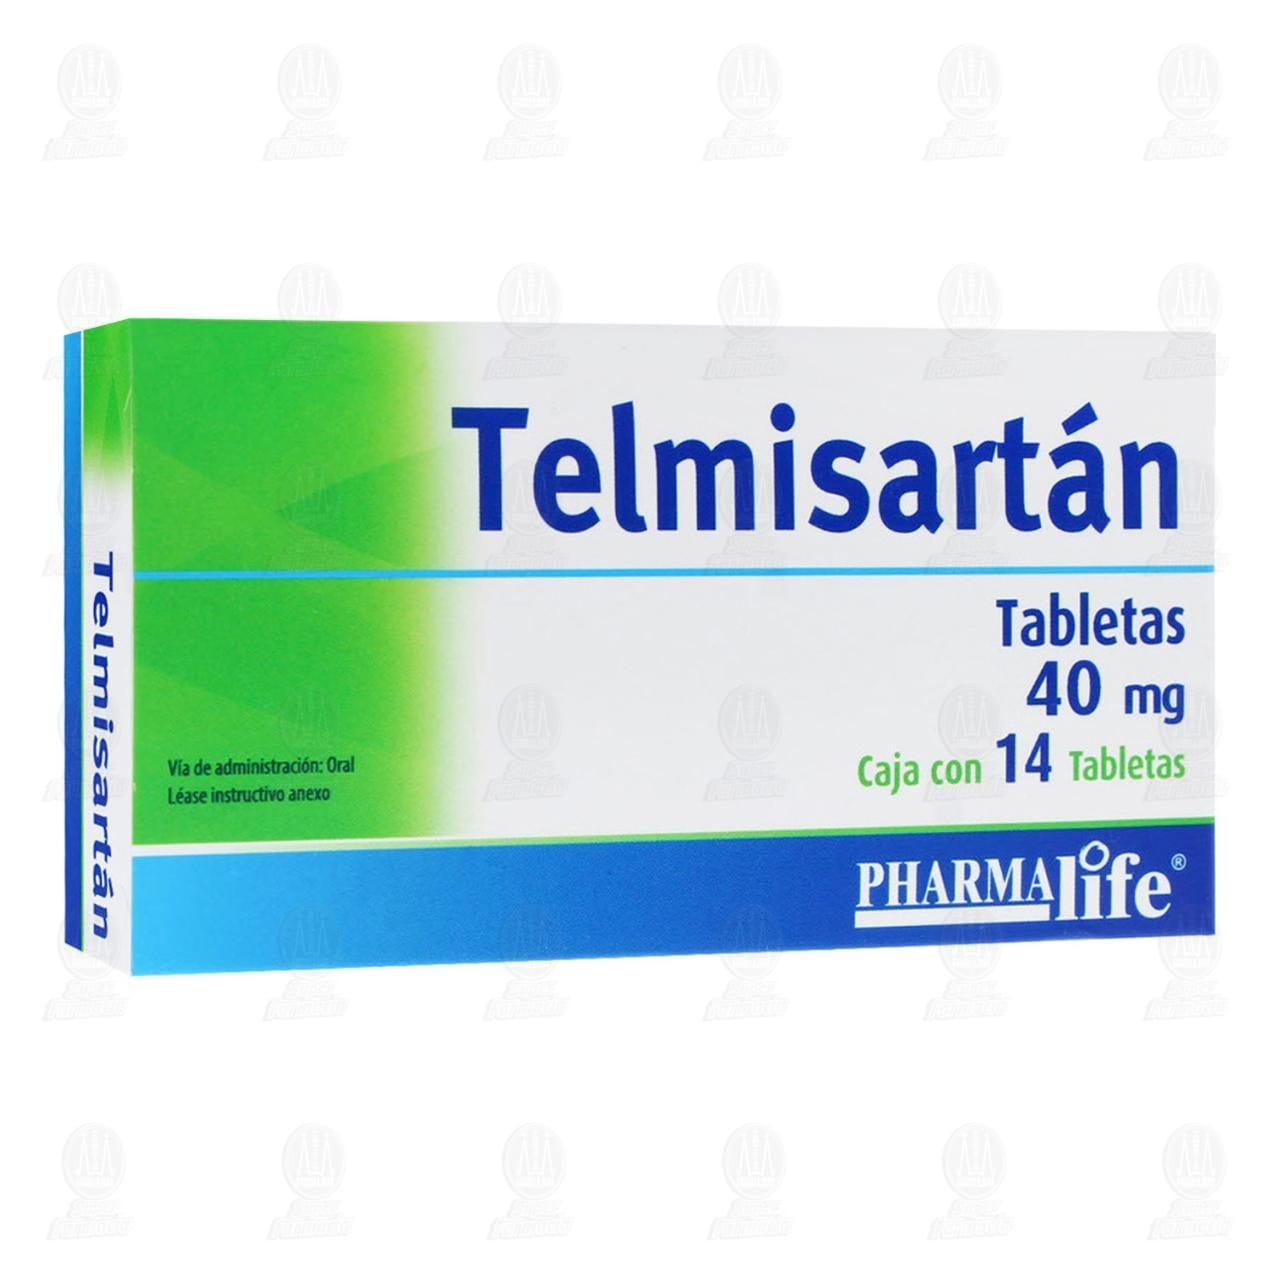 Comprar Telmisartán 40mg 14 Tabletas Pharmalife en Farmacias Guadalajara